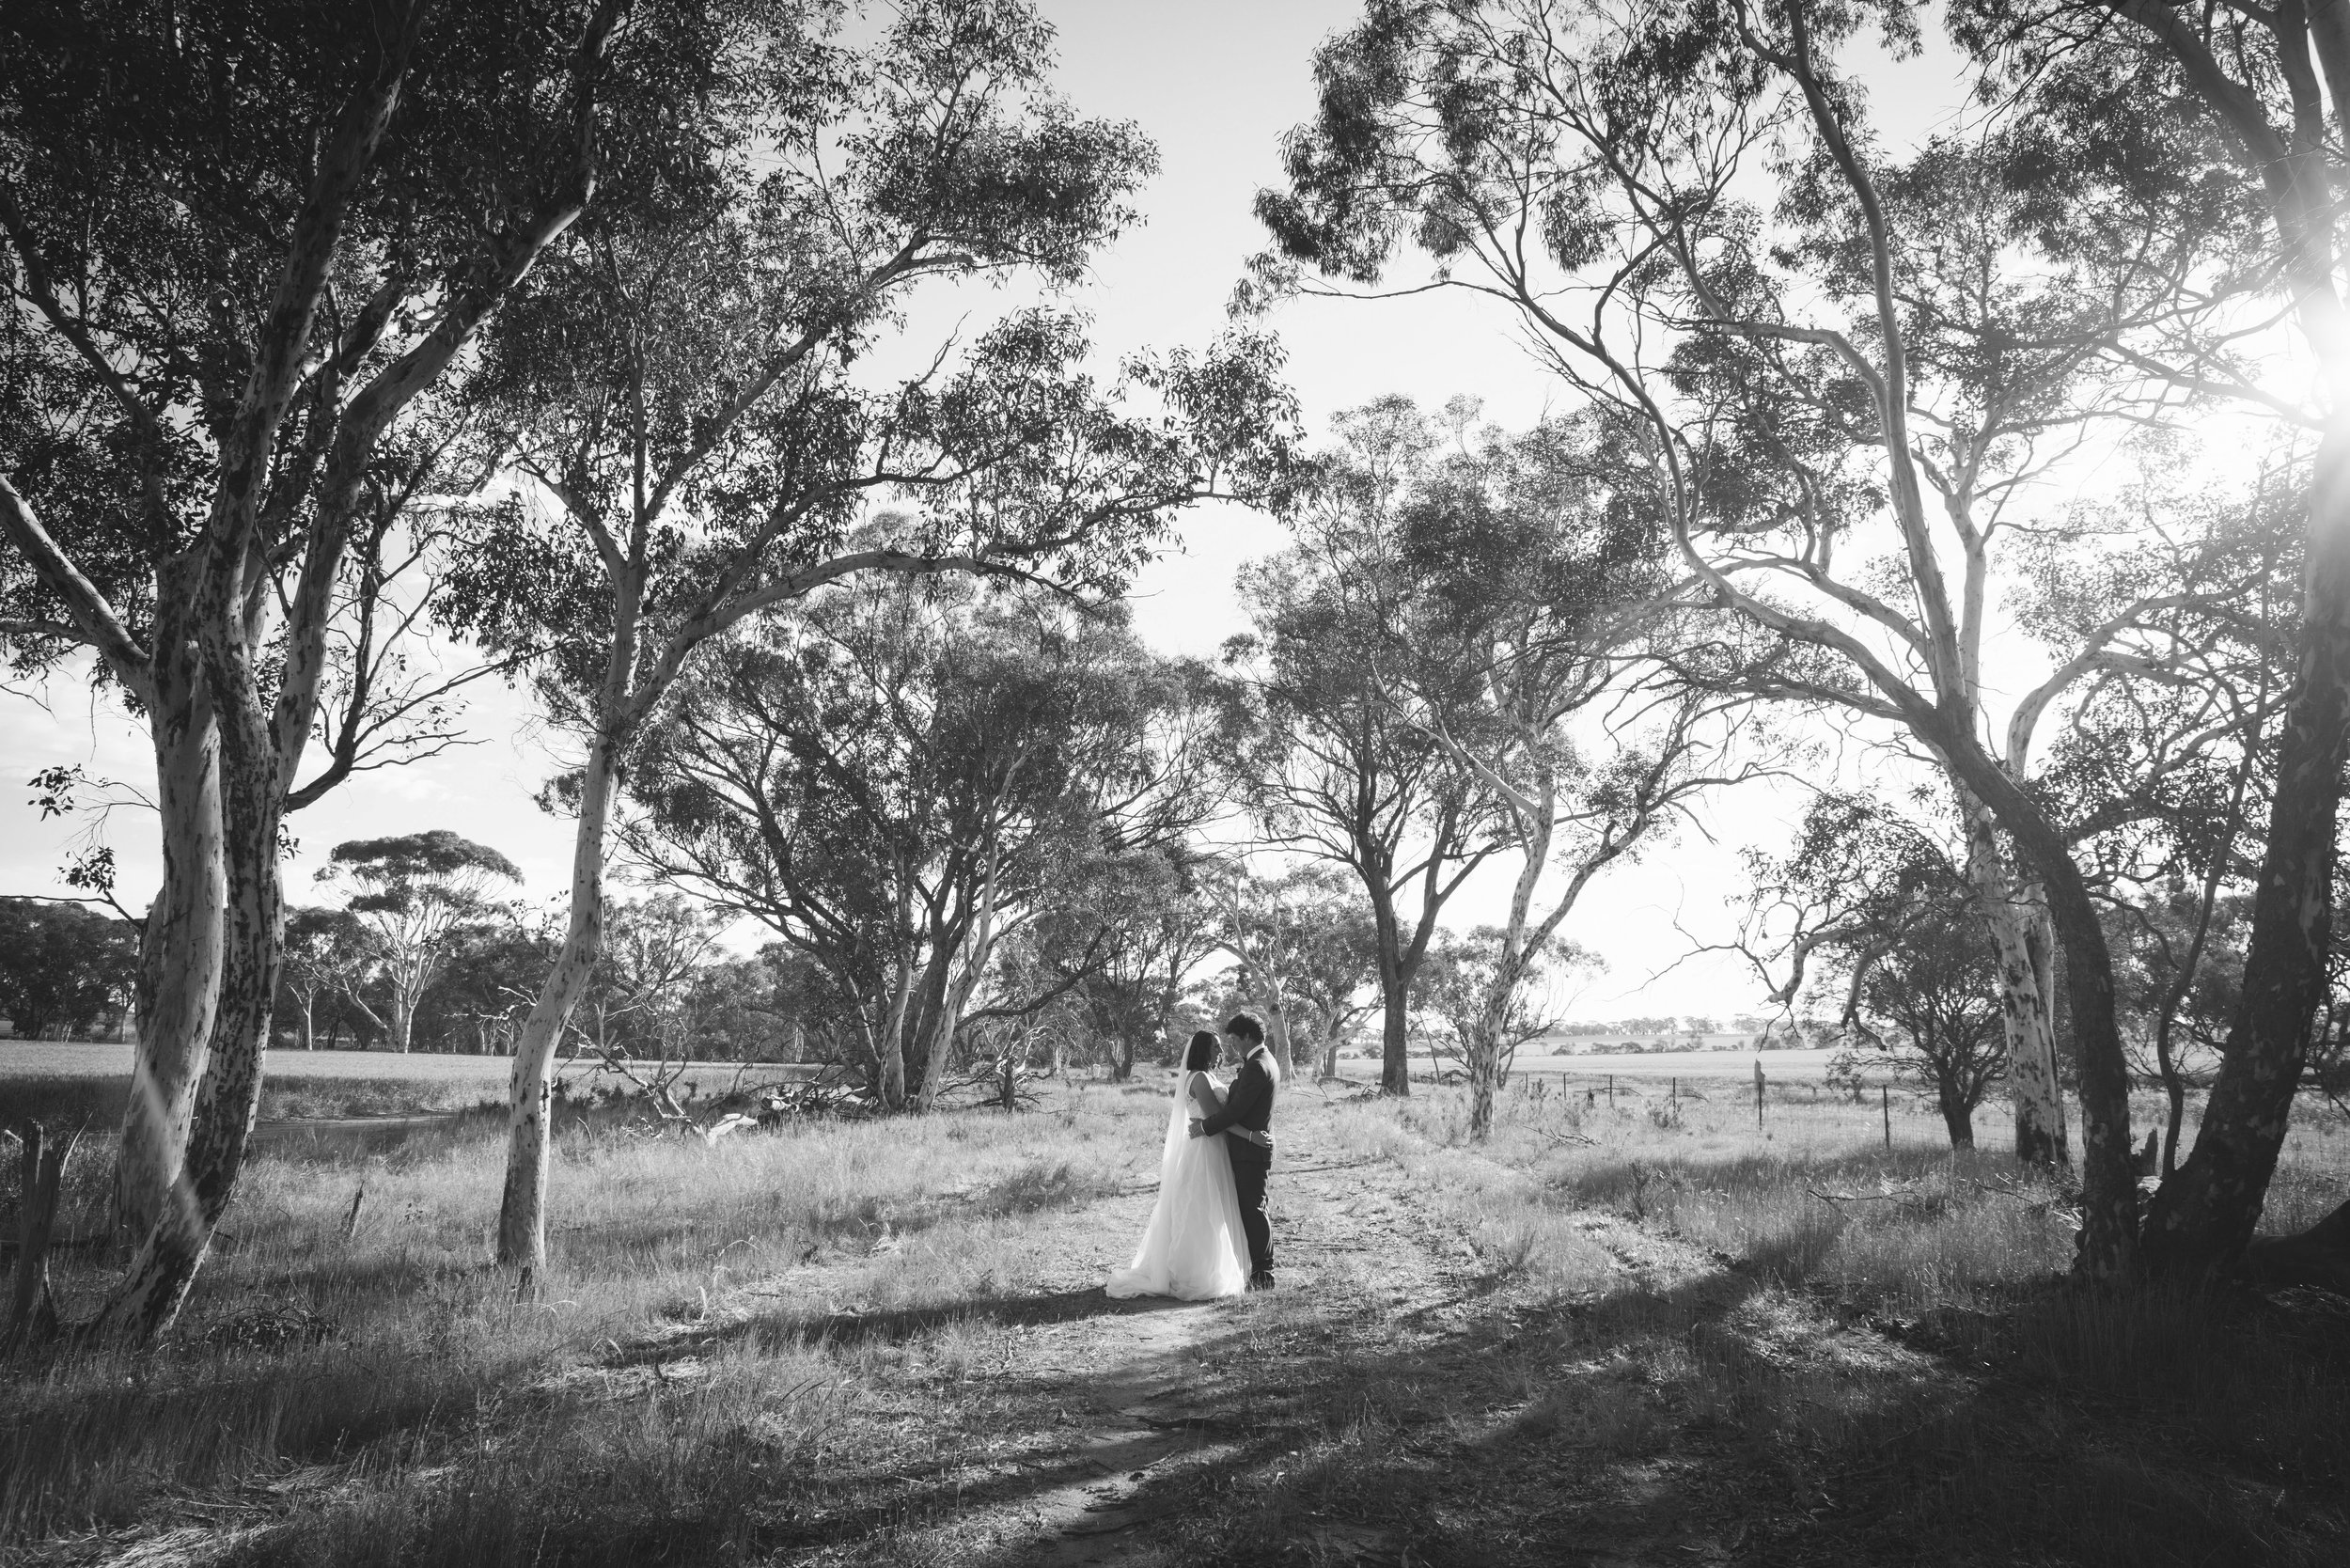 Angie Roe Photography Wheatbelt Avon Valley Farm Wedding (40).jpg